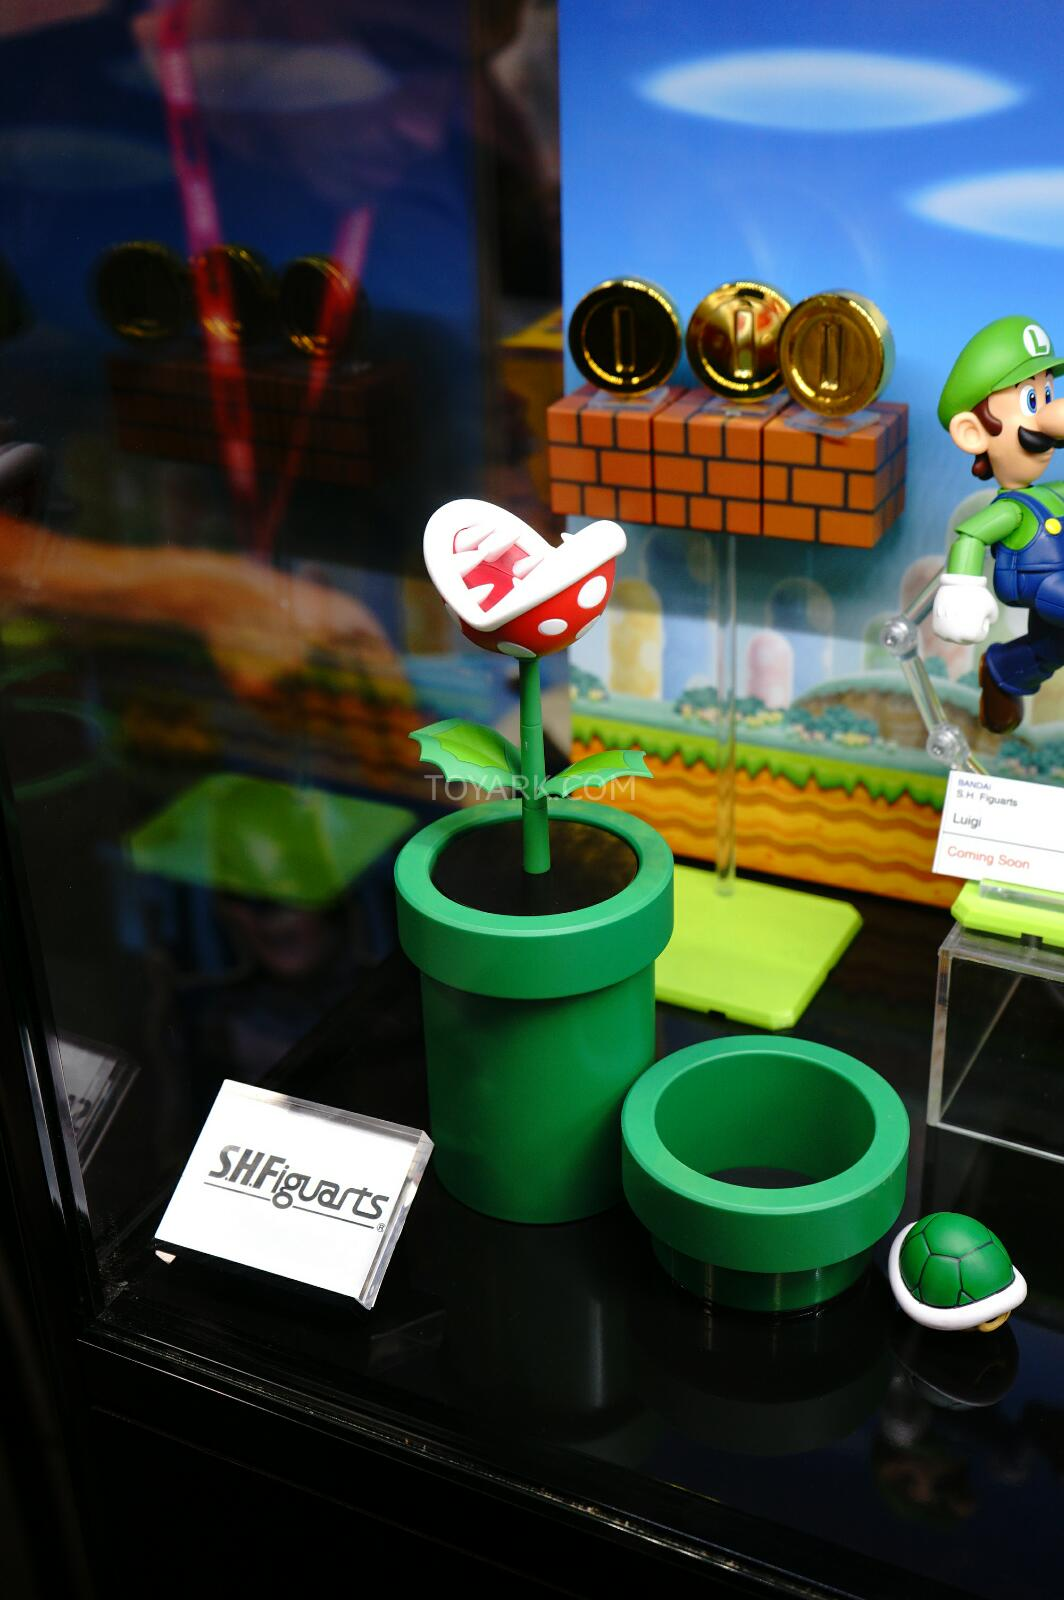 SDCC-2014-Tamashii-SH-Figuarts-Mario-and-Luigi-005